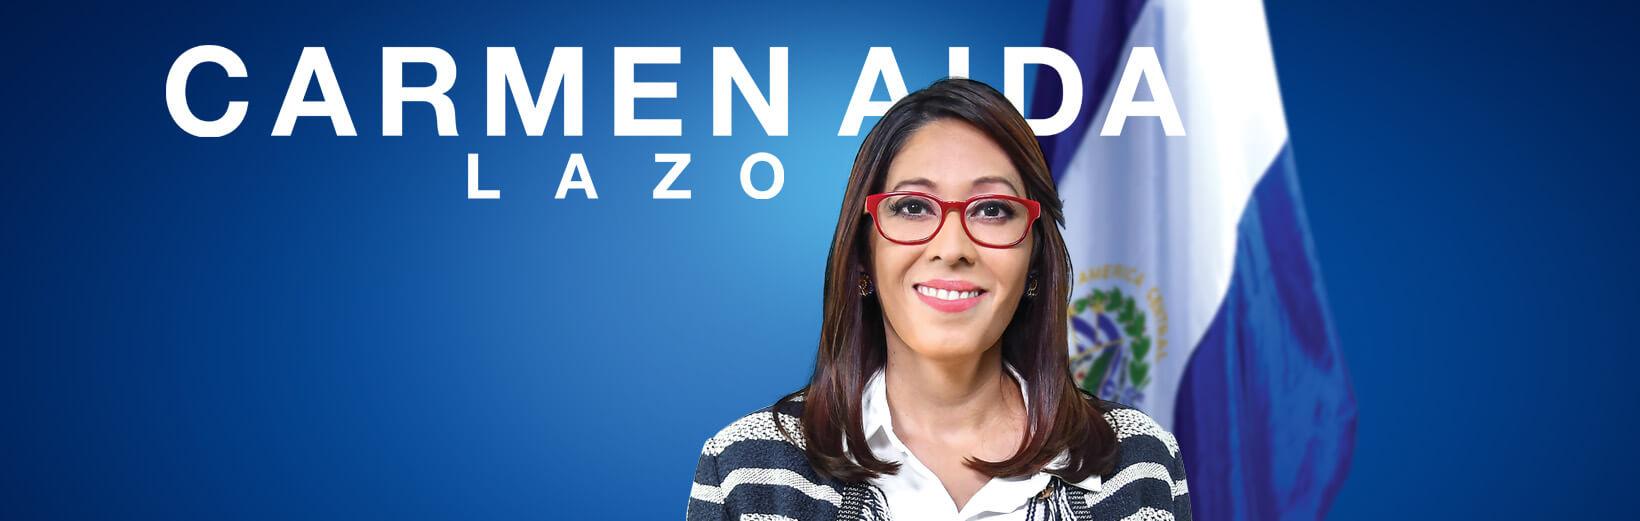 Carmen Aída Lazo Vicepresidenta